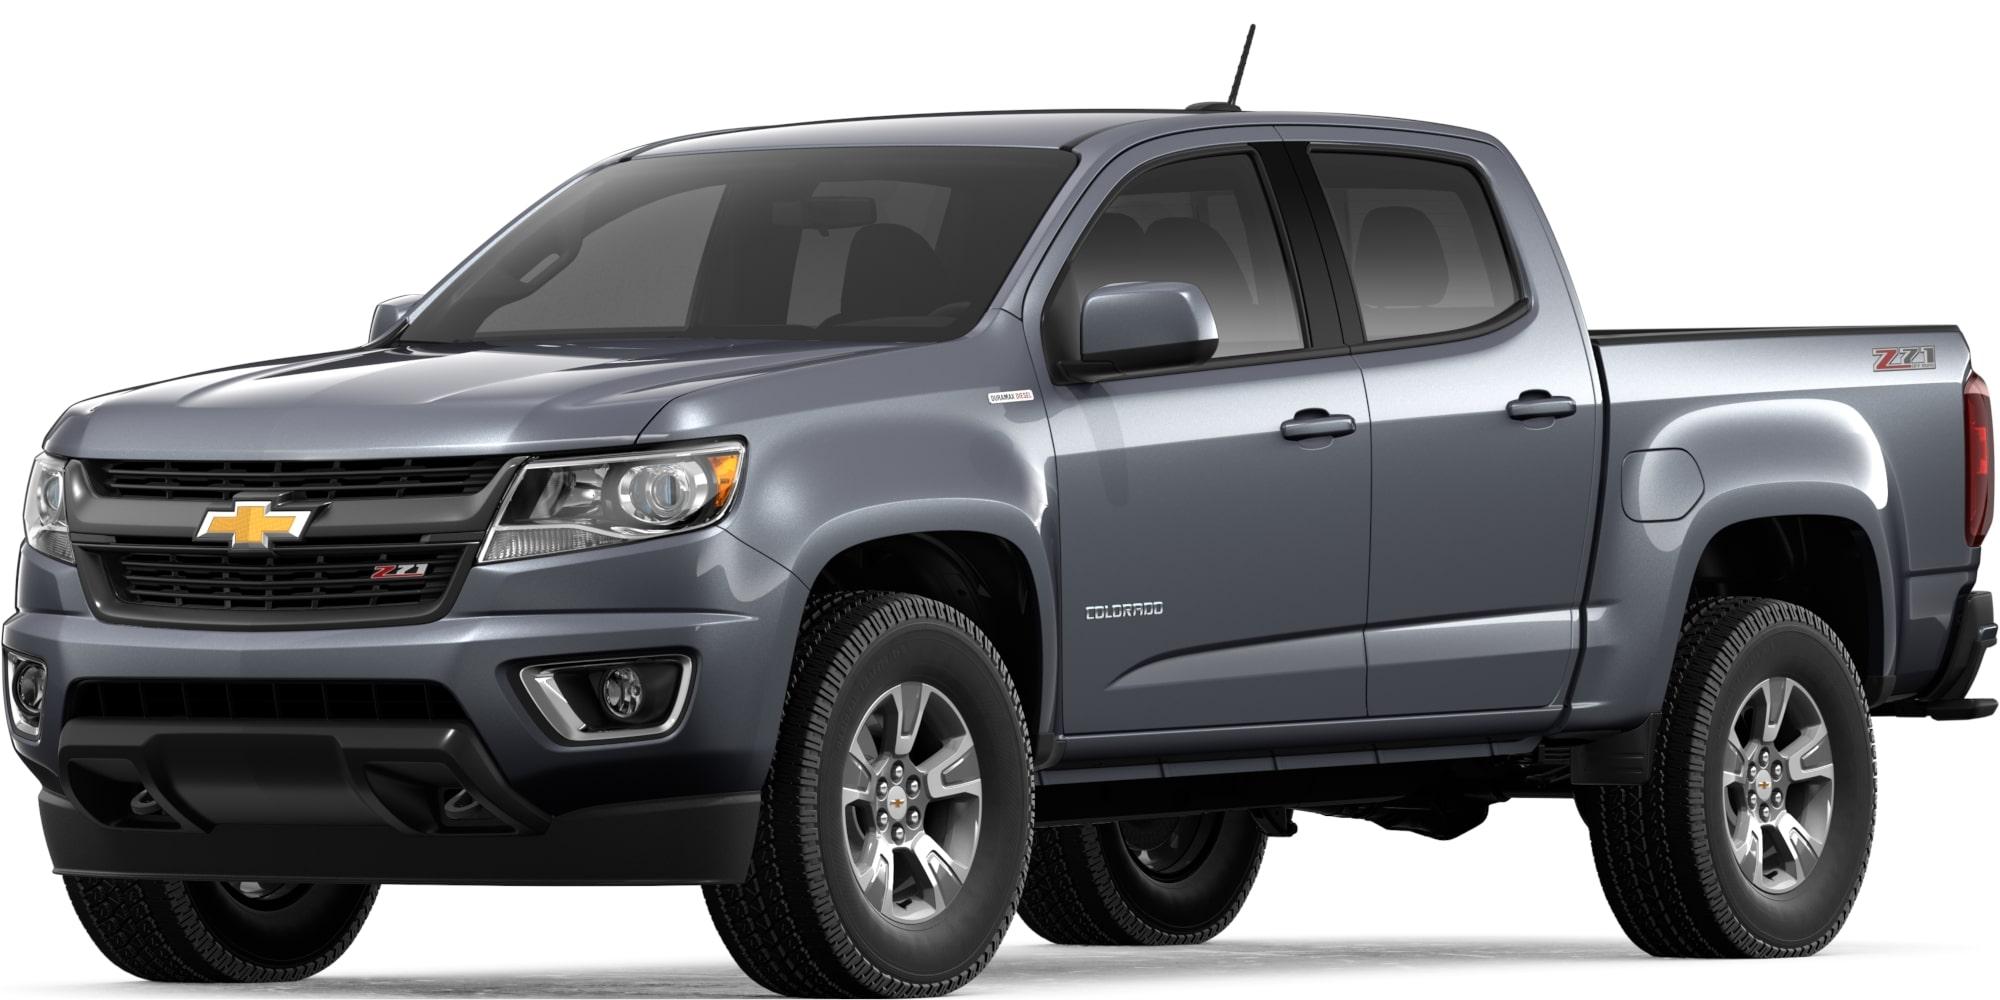 2019 colorado mid size truck diesel truck Blue Chevy Colorado satin steel metallic